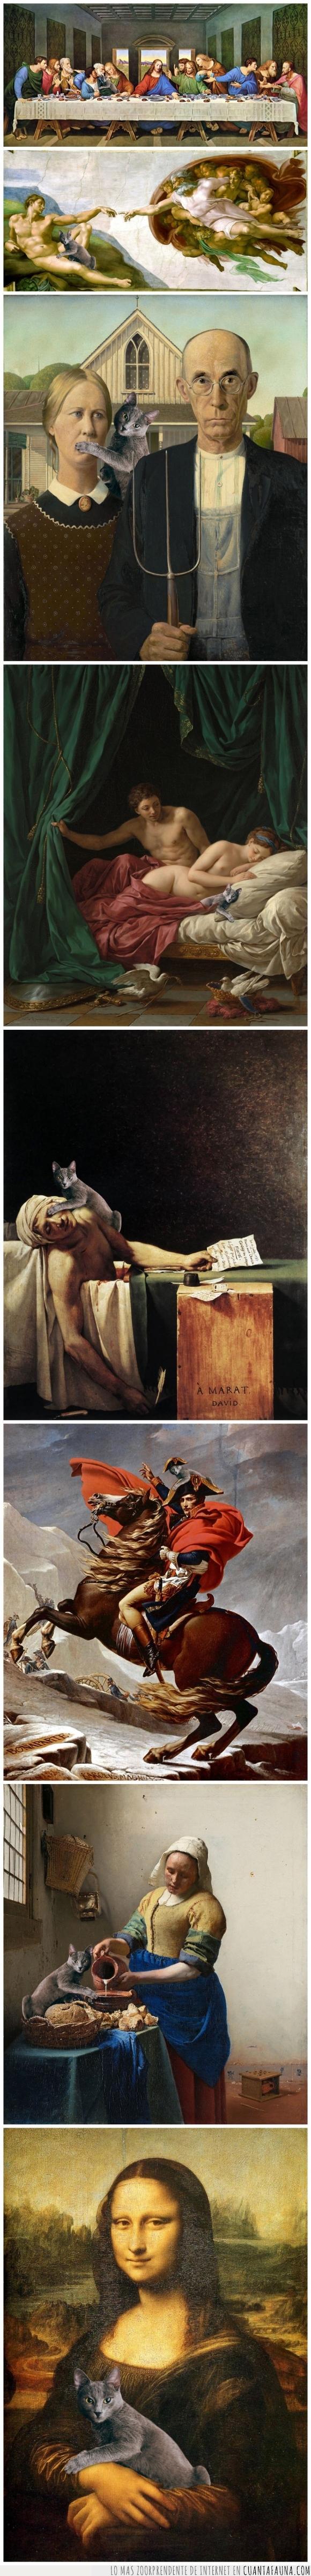 arte,chop,cuadro,gato,montaje,photoshop